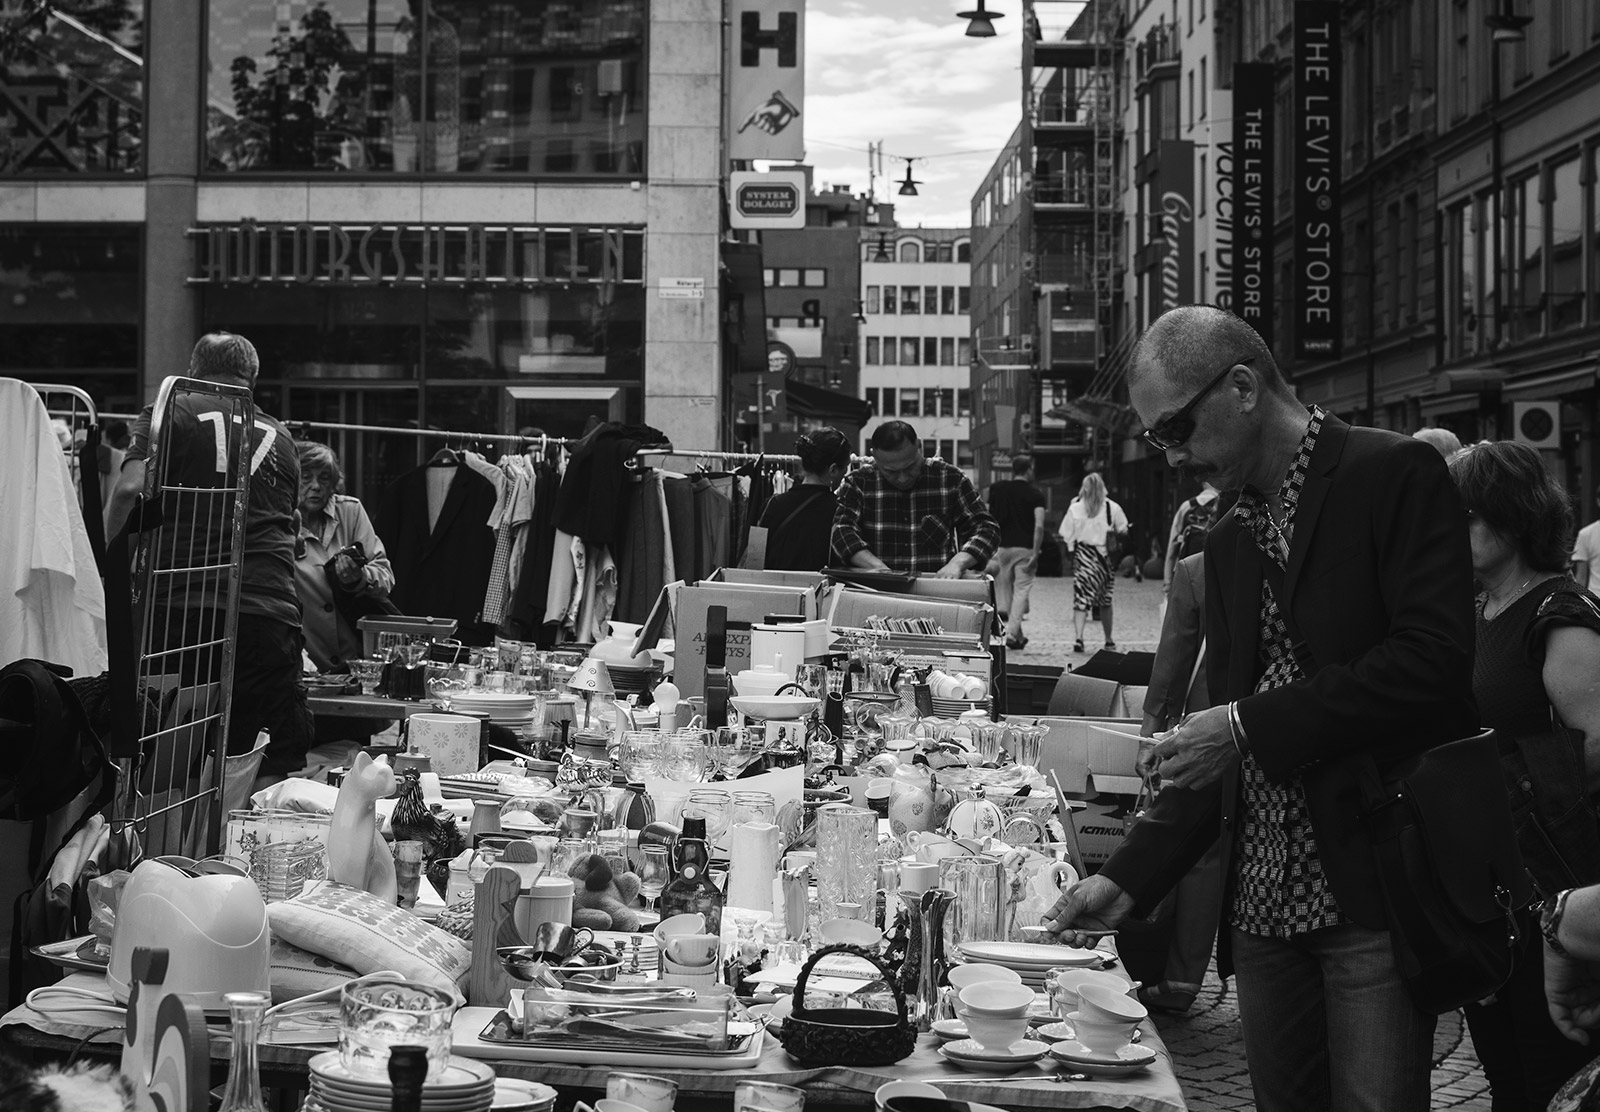 Man looking at a market stall